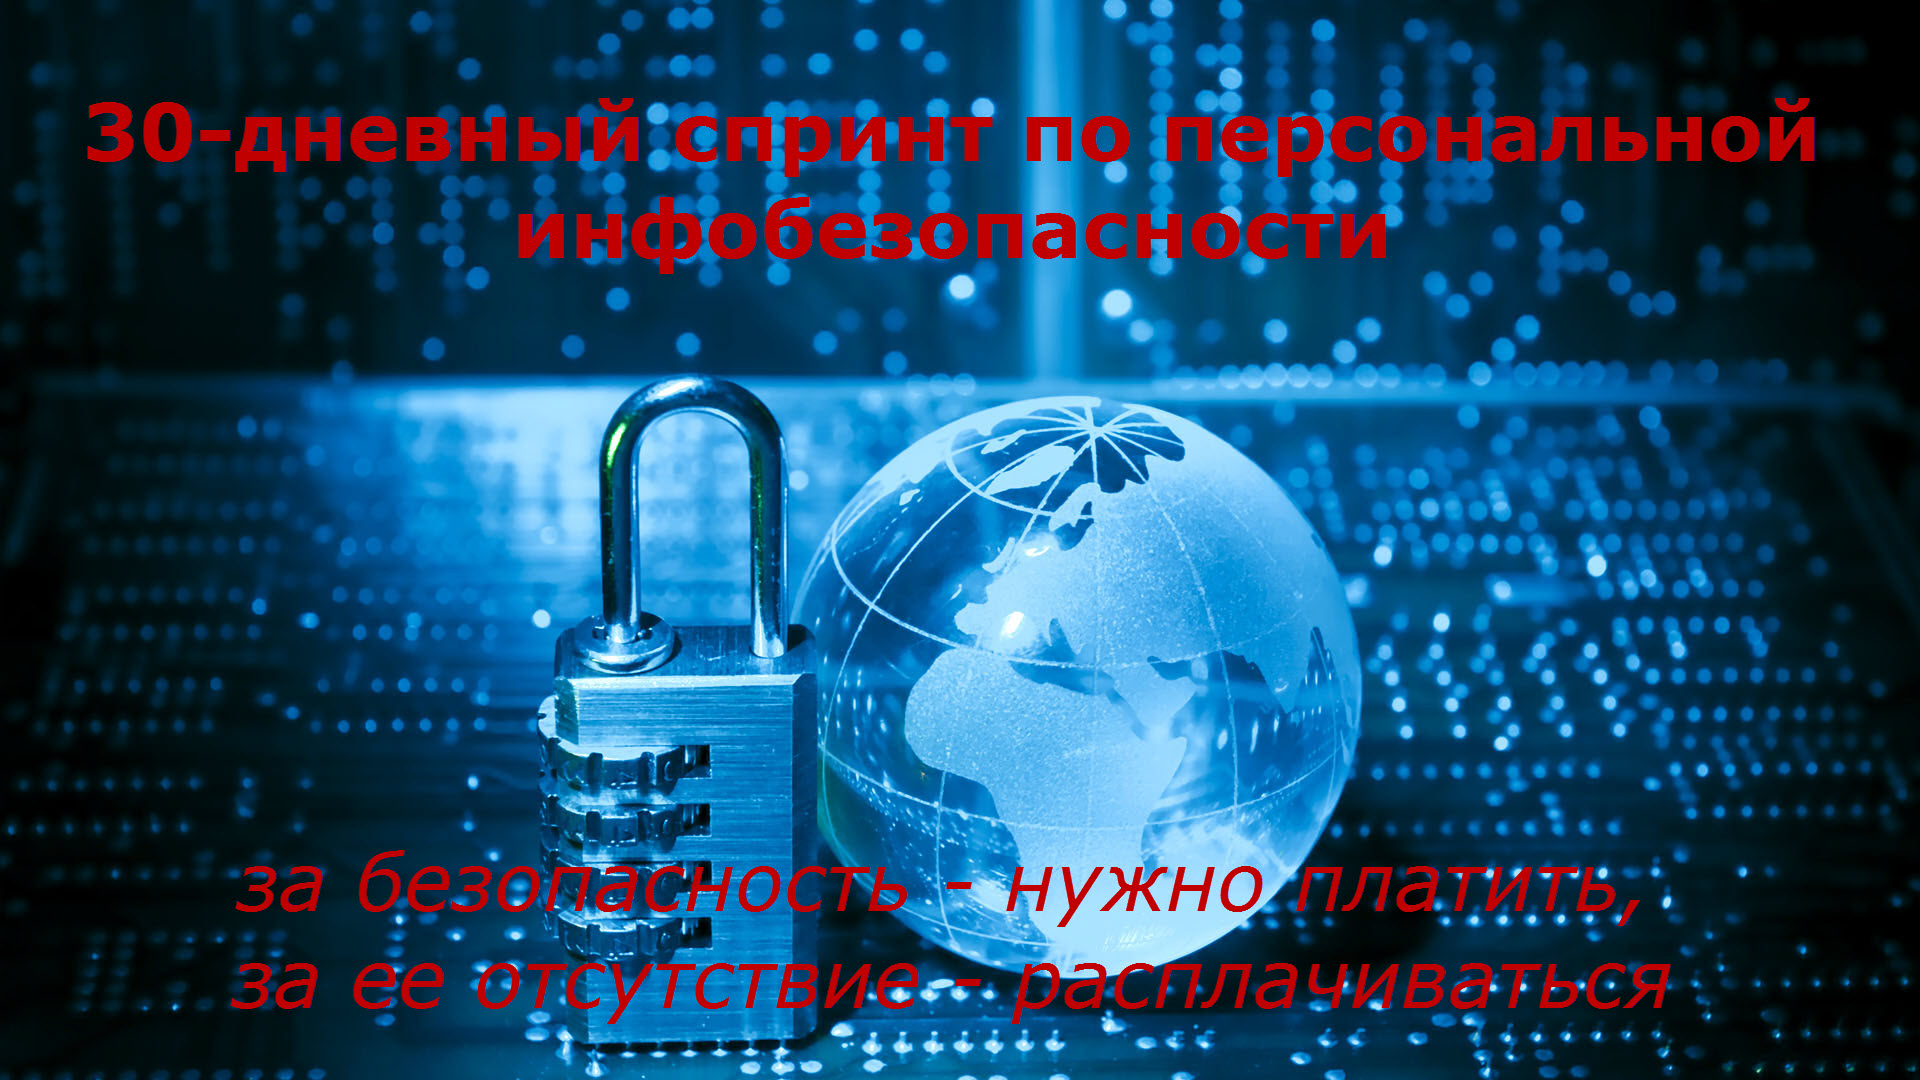 infosecurity 3 red.jpg